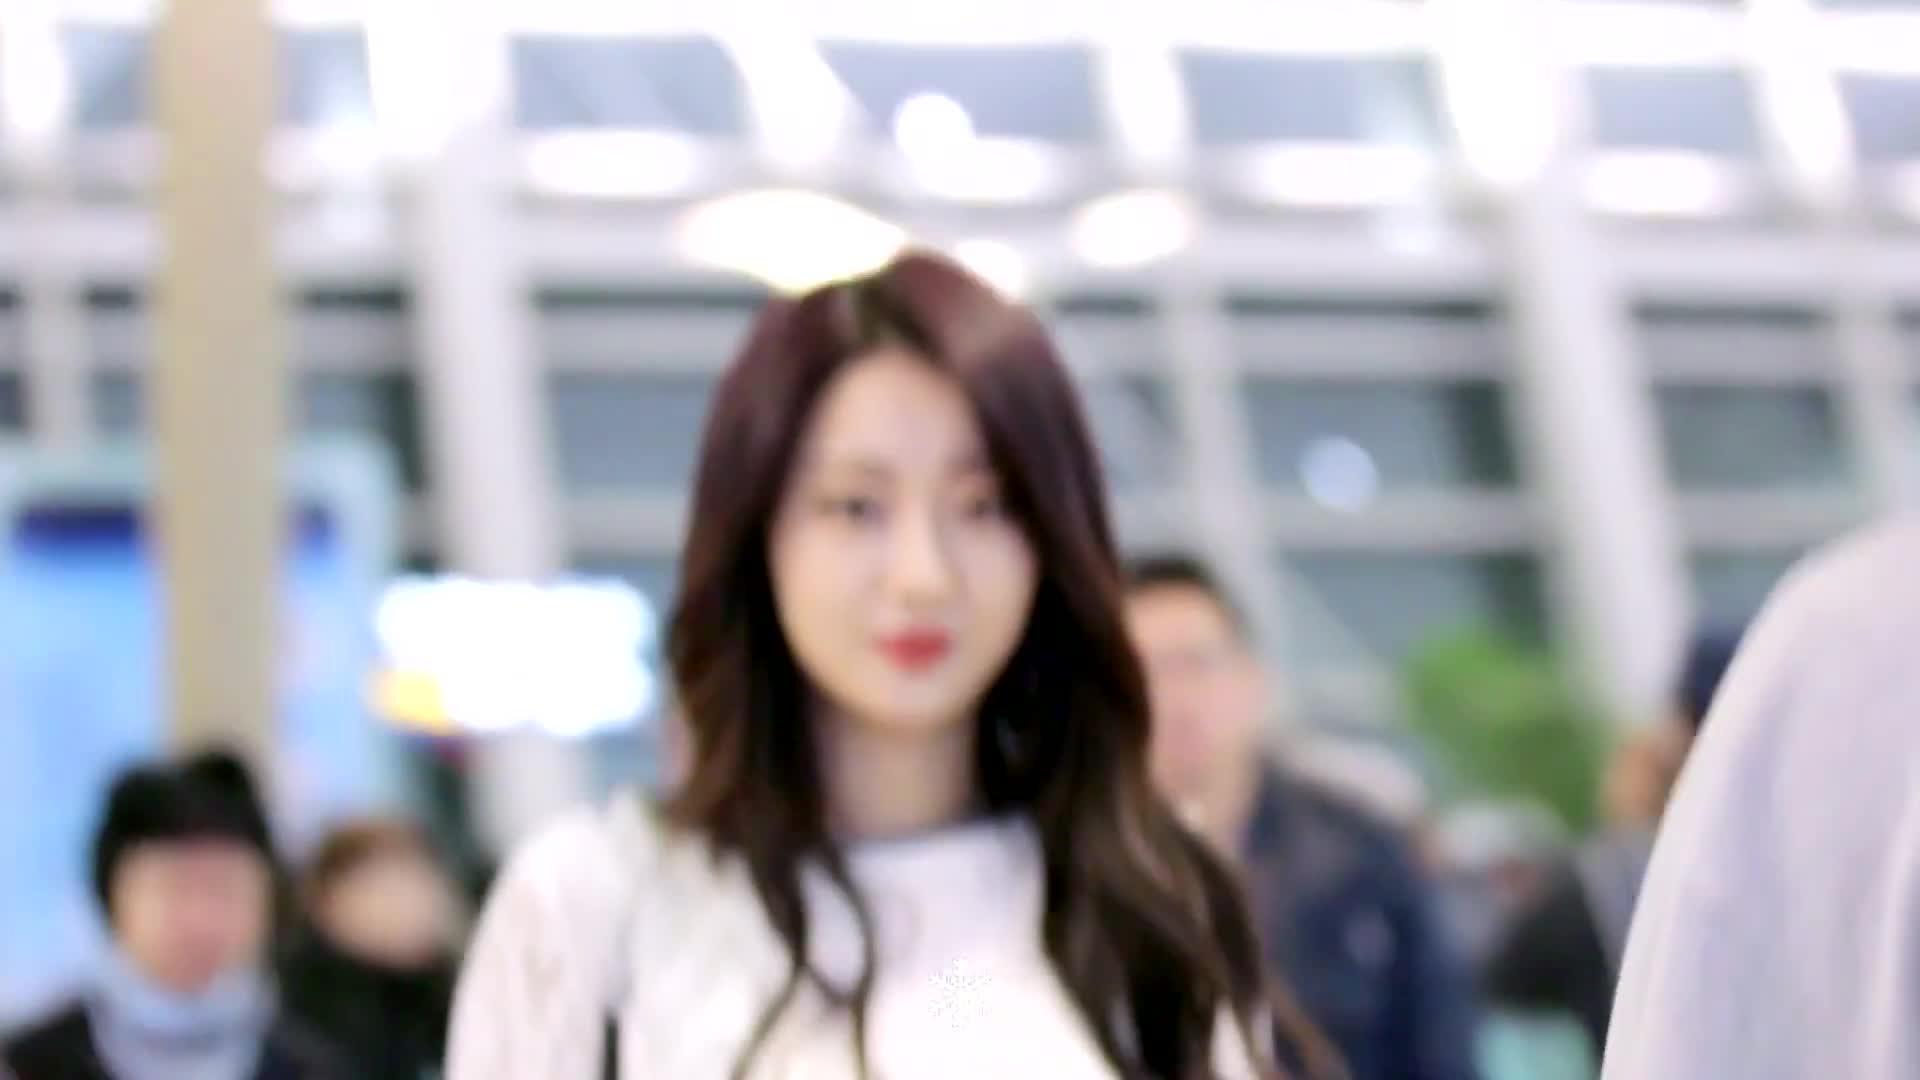 9muses, gyeongree, kpop, kyungri, Kyungri Blep GIFs